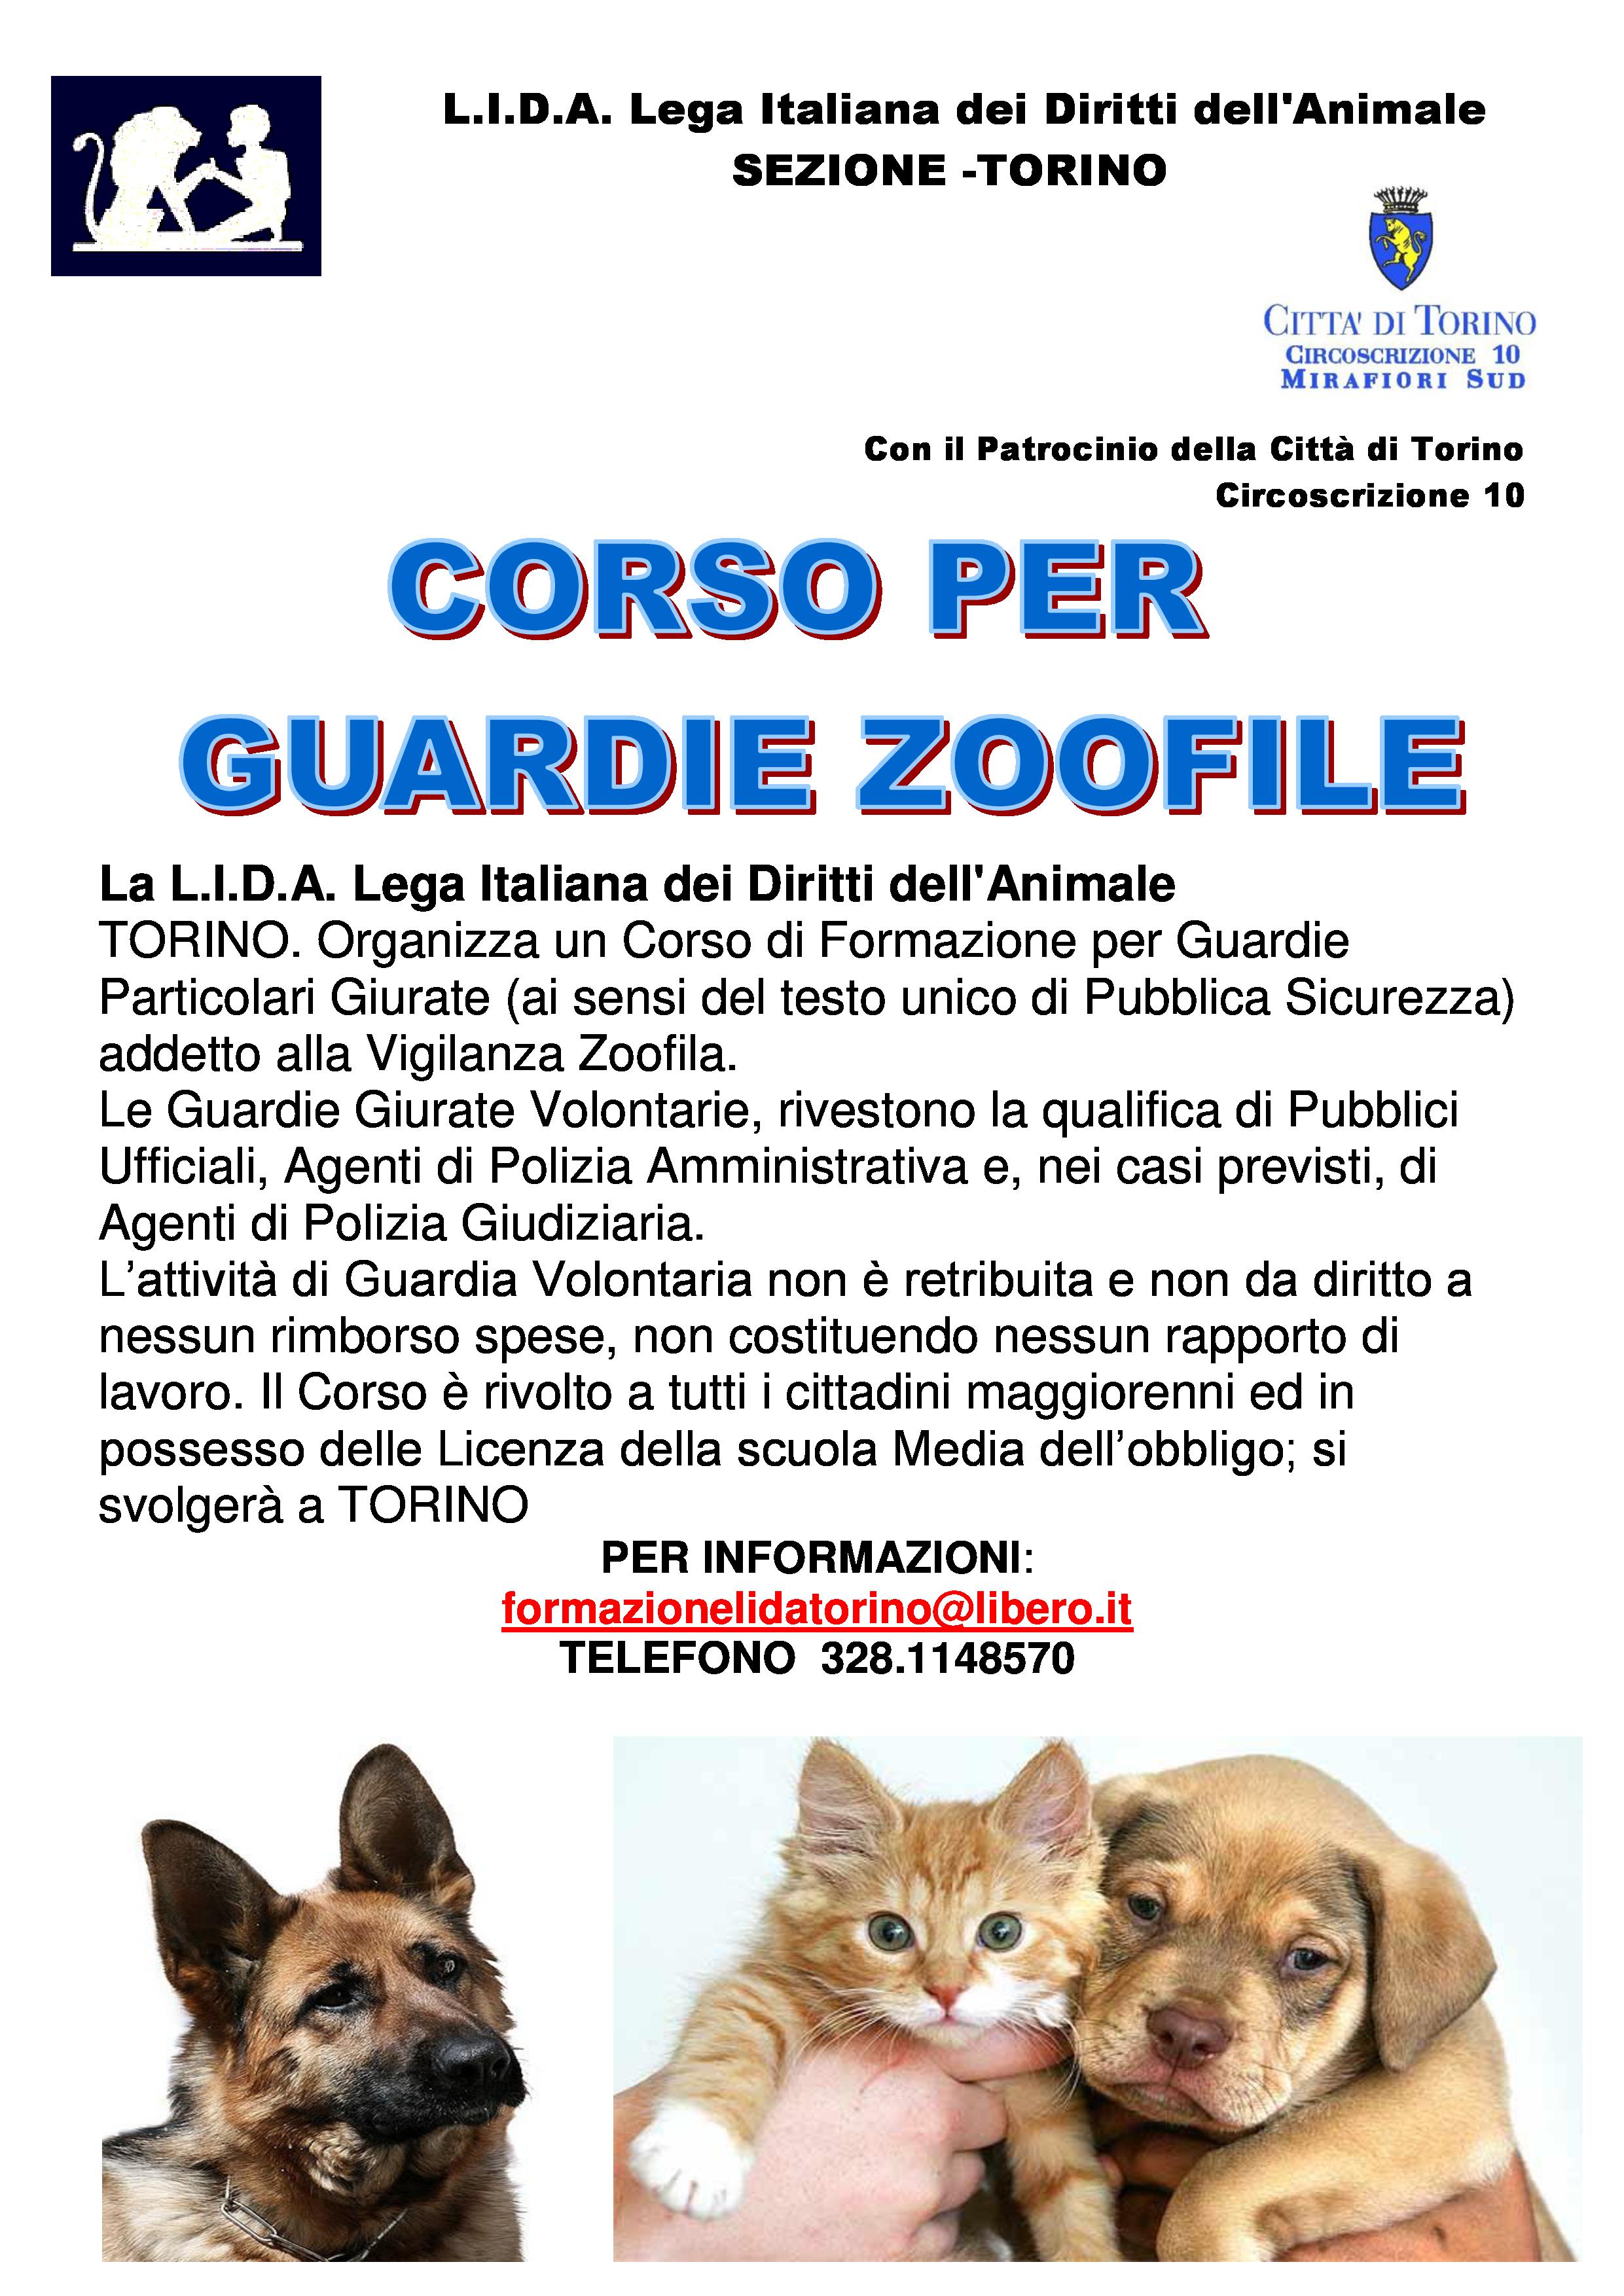 Corso GUARDIE ZOOFILE LIDA